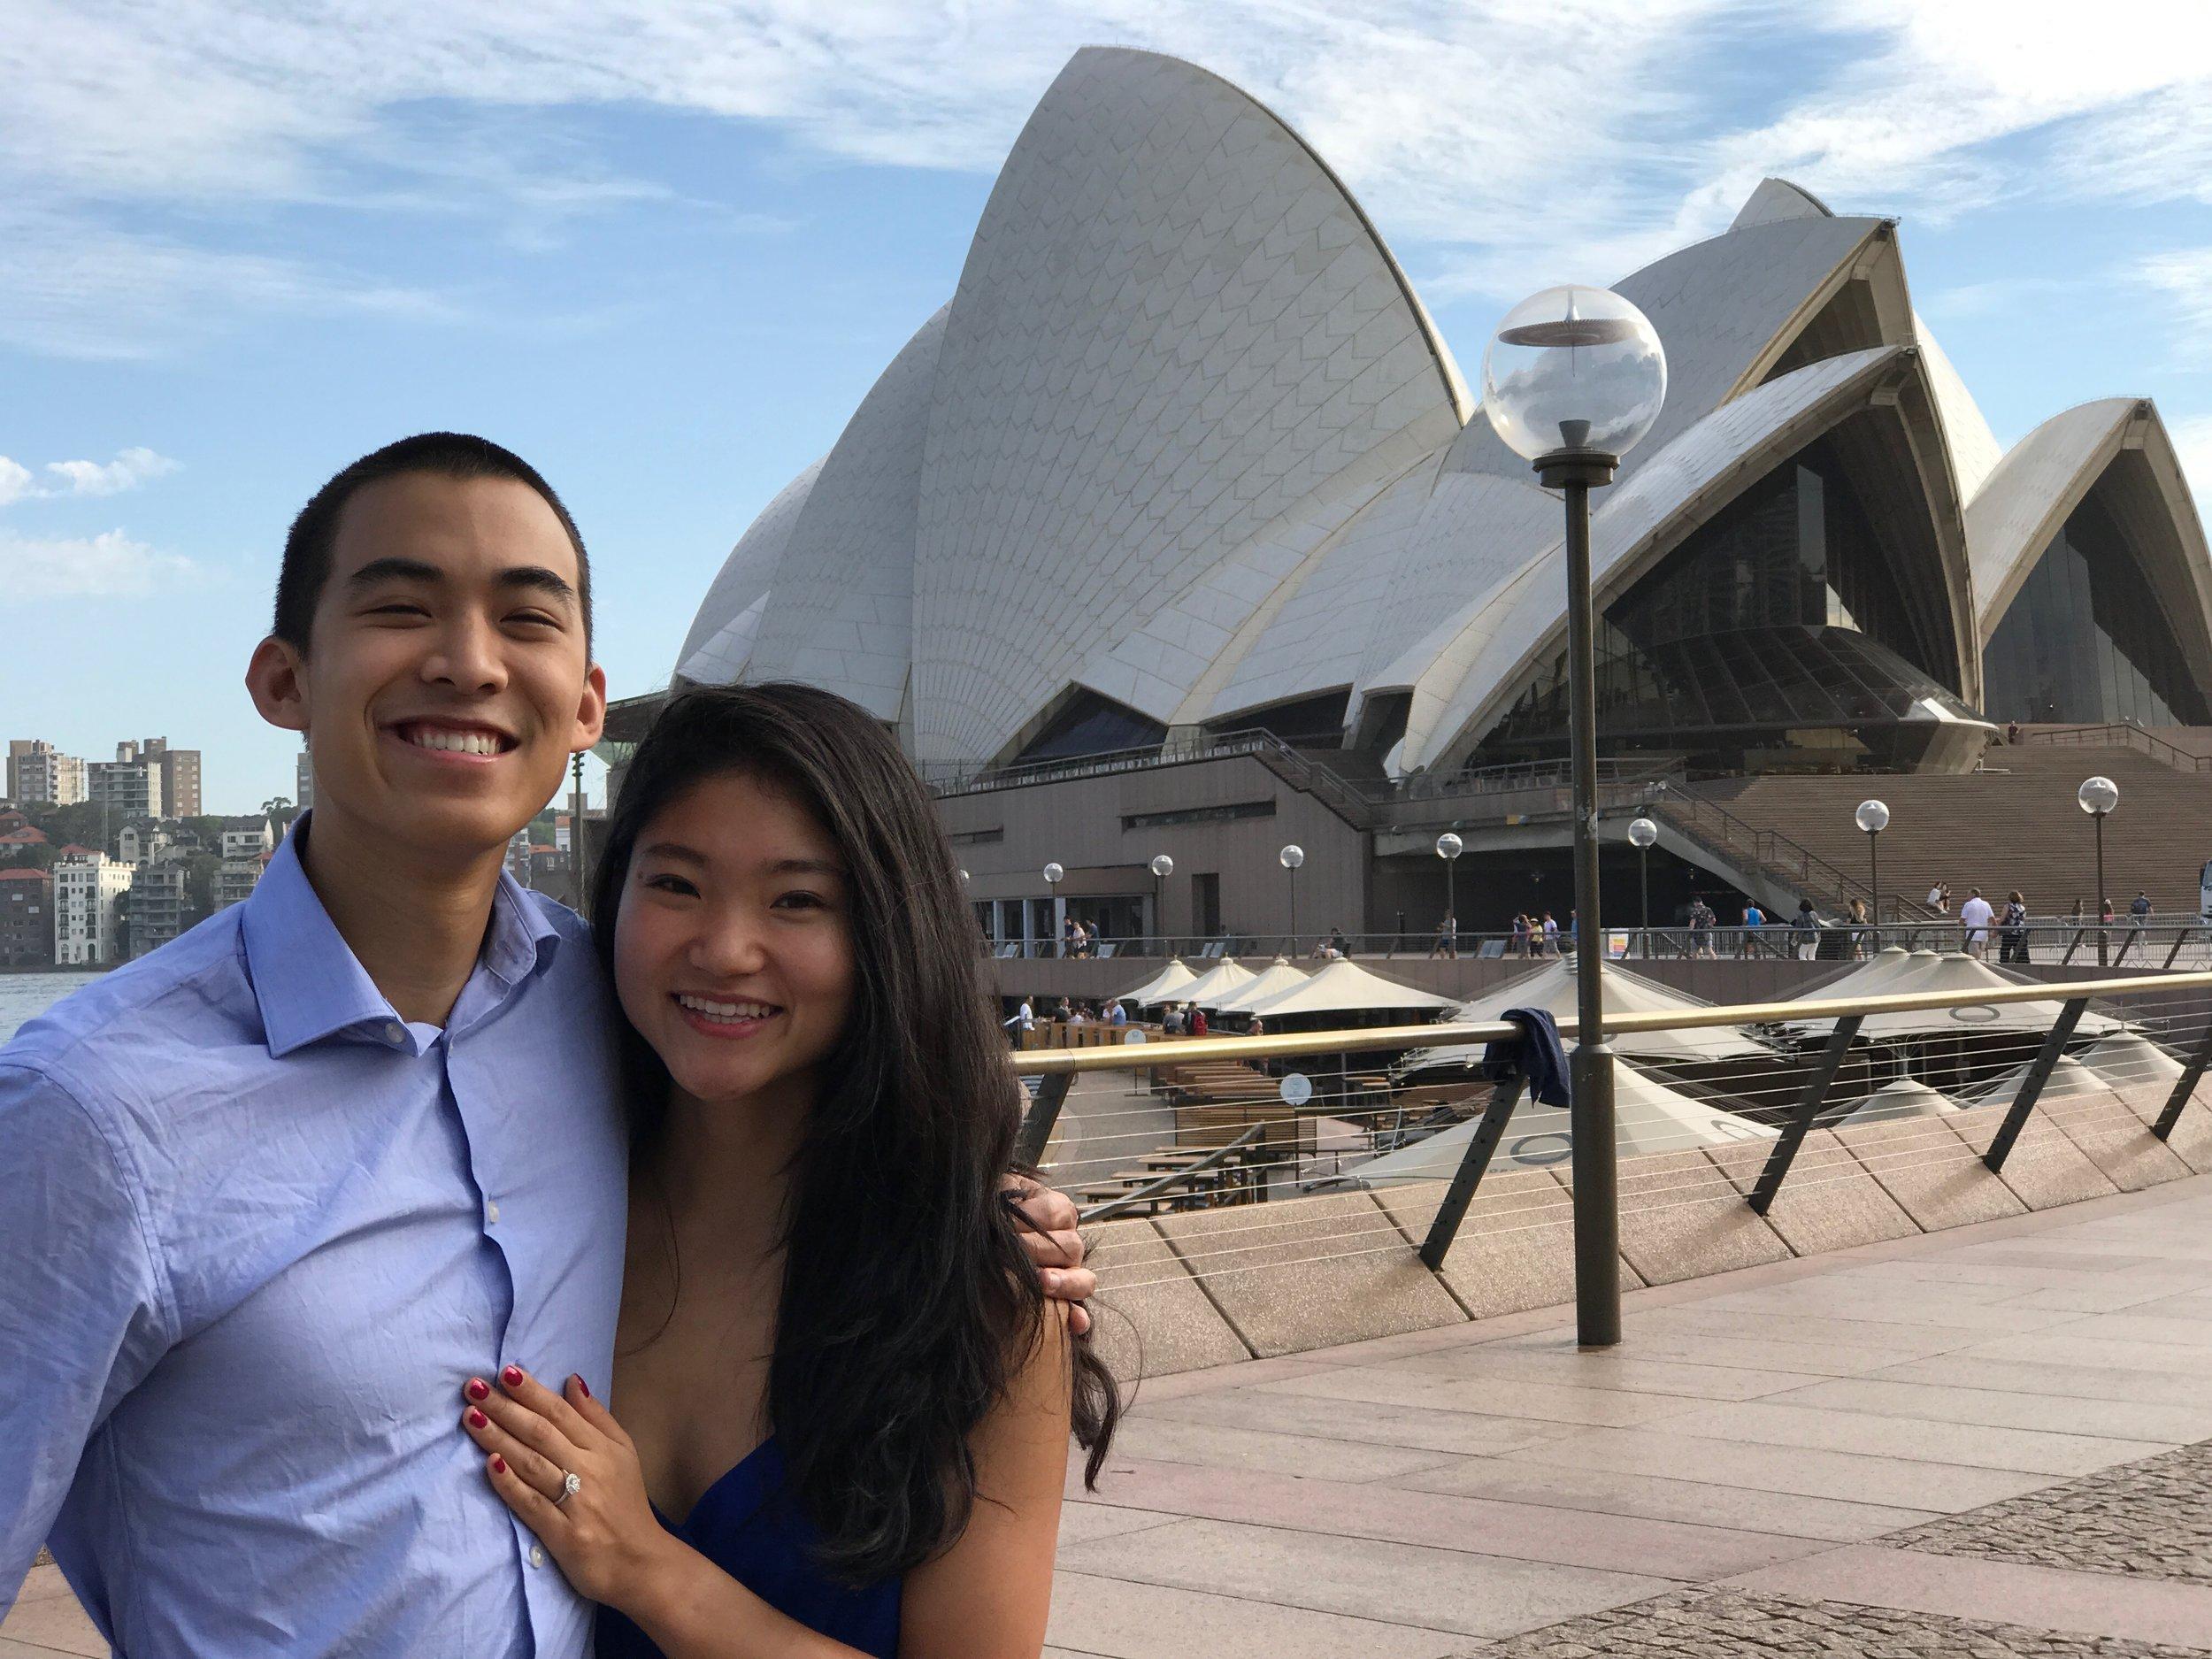 Engaged in Sydney, Australia - 2017